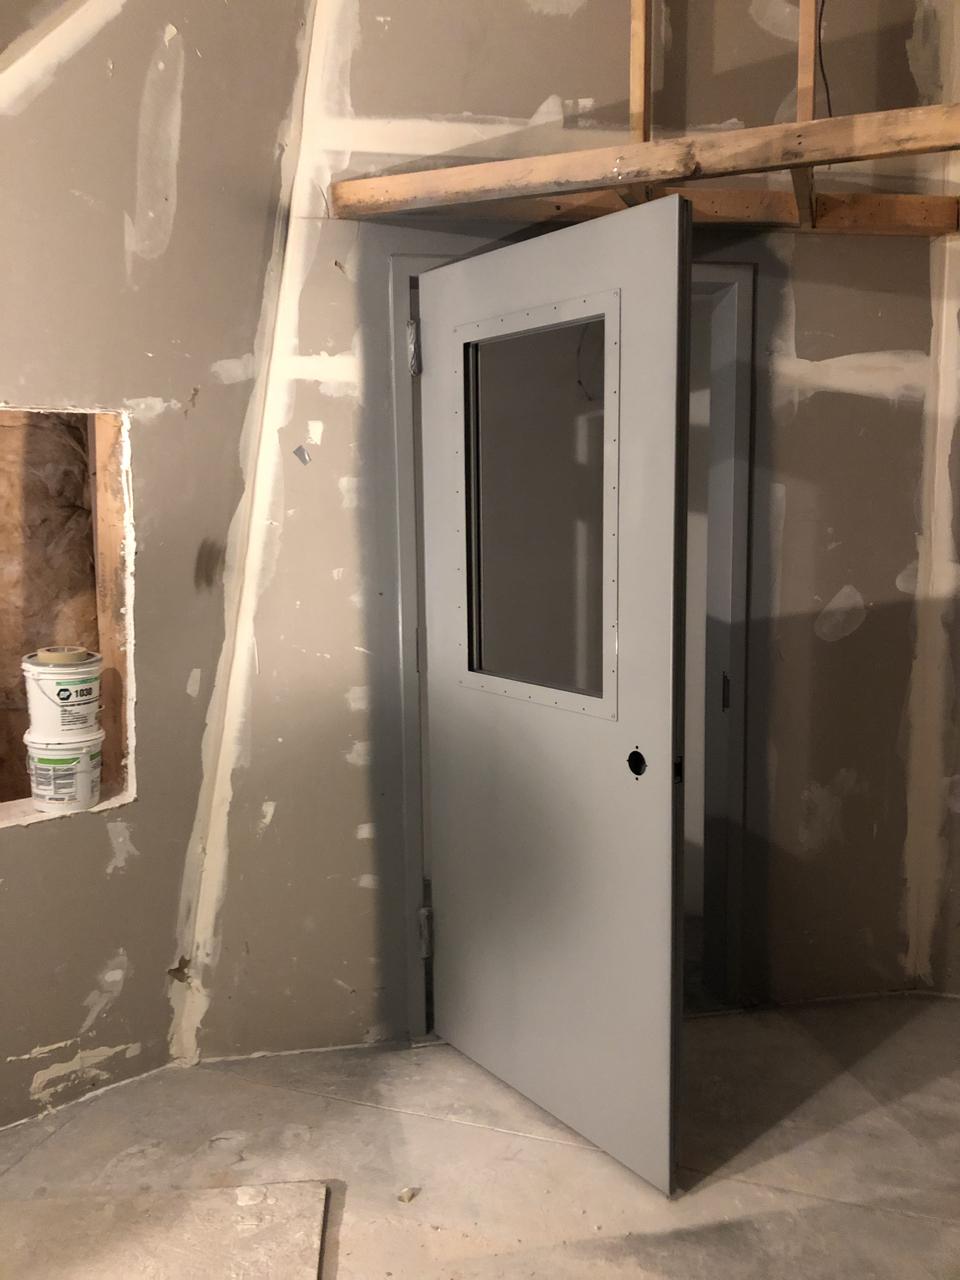 The door from control room 2 into machine room 2.